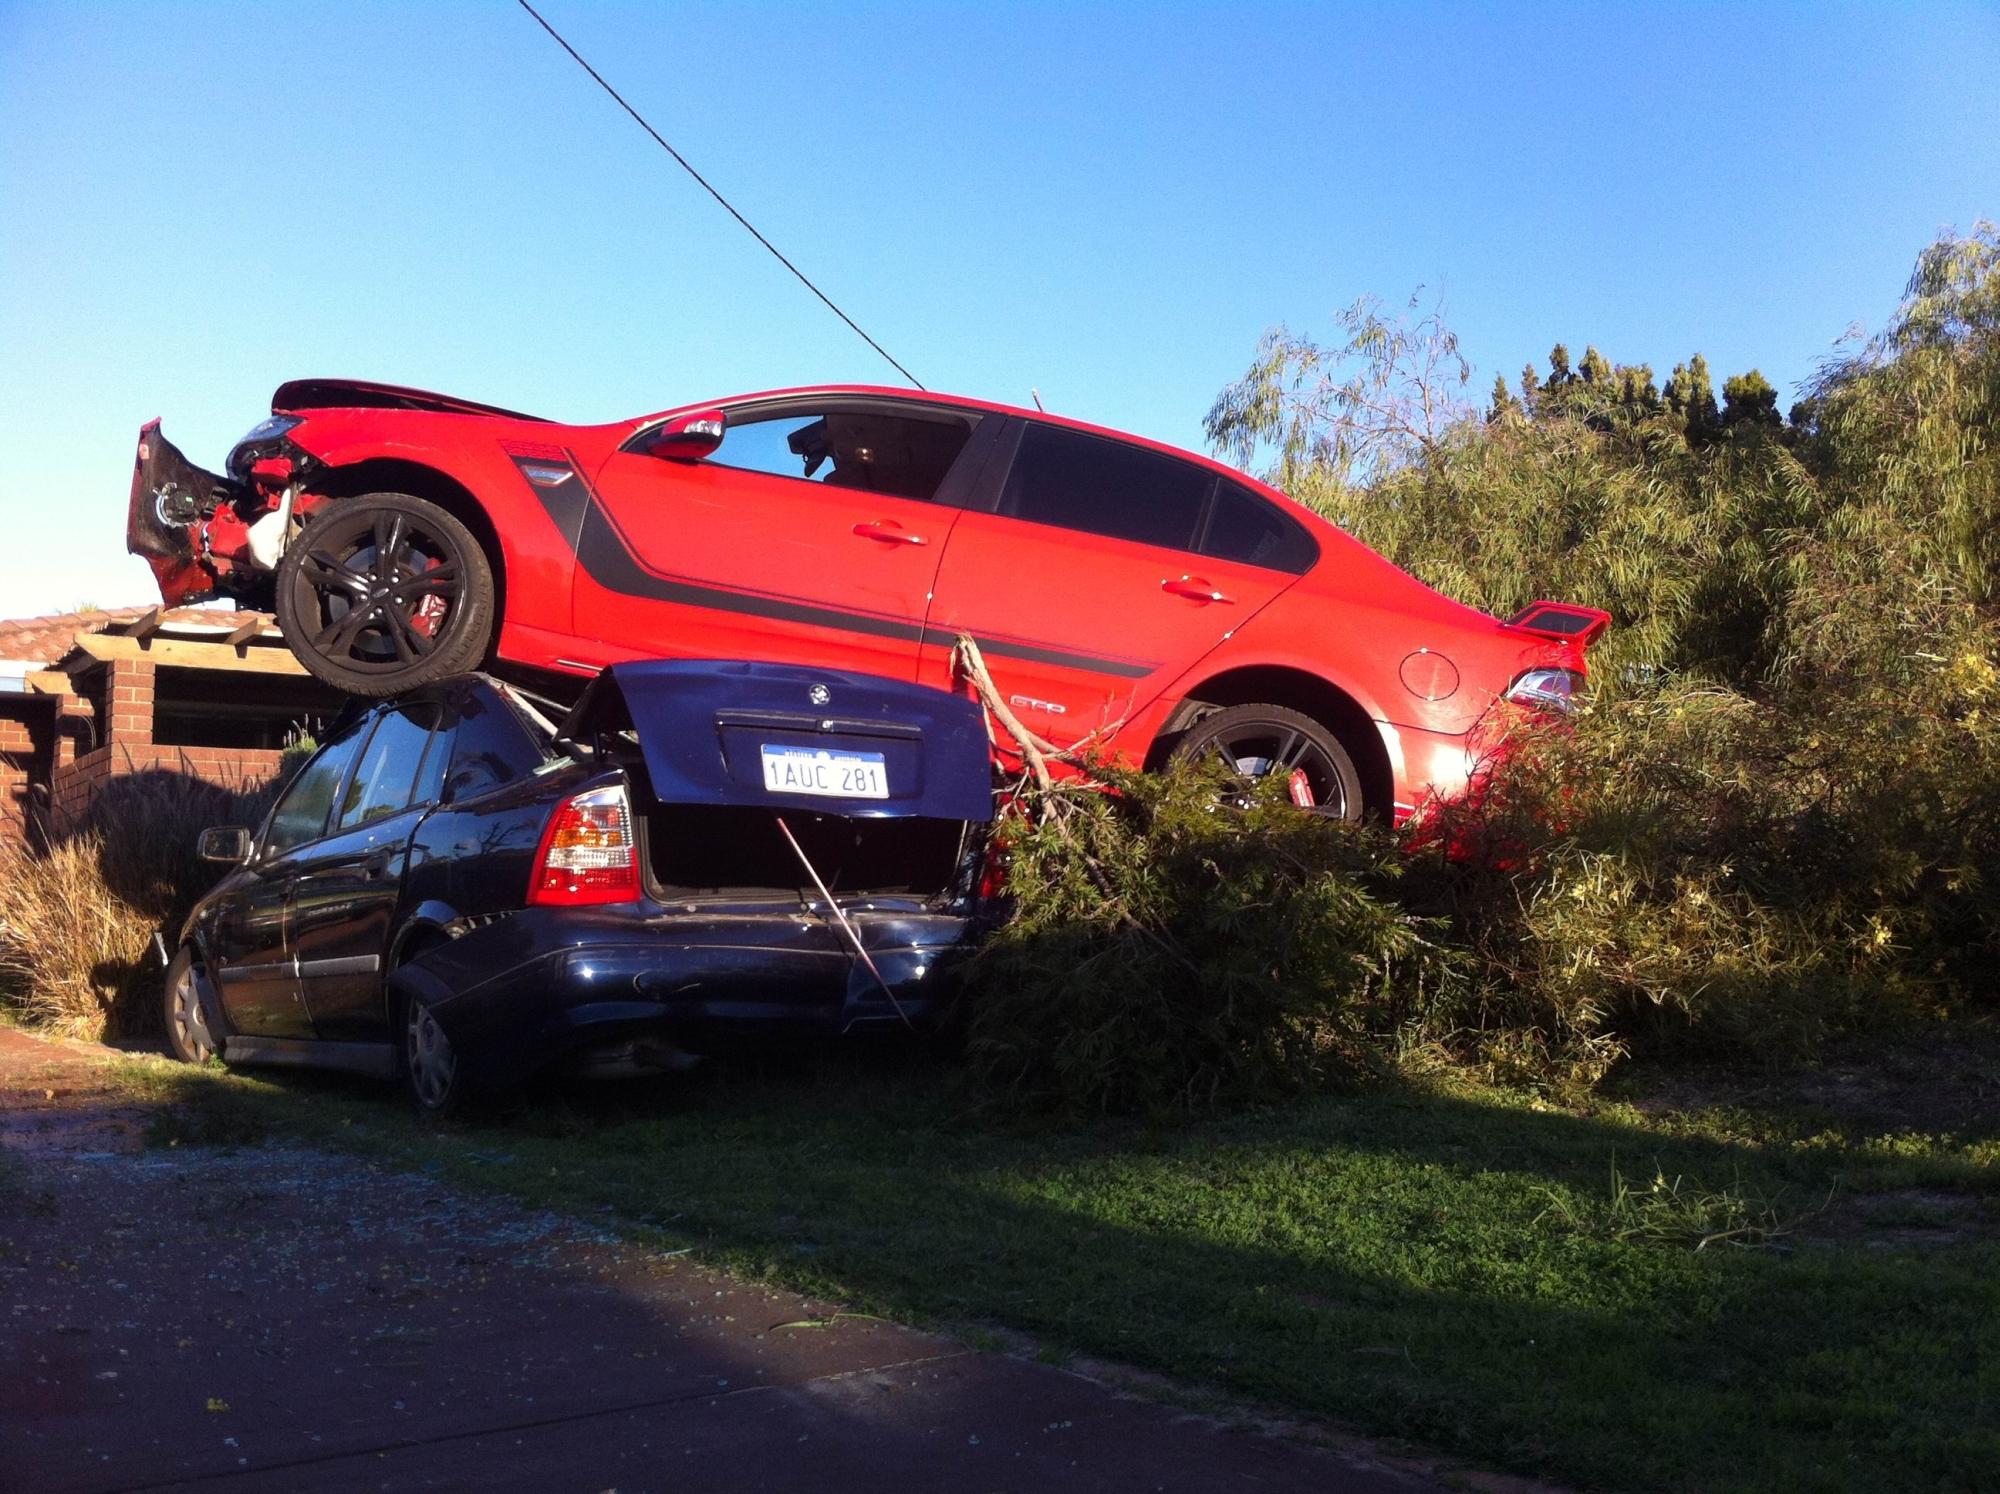 The scene of the crash on Monday.